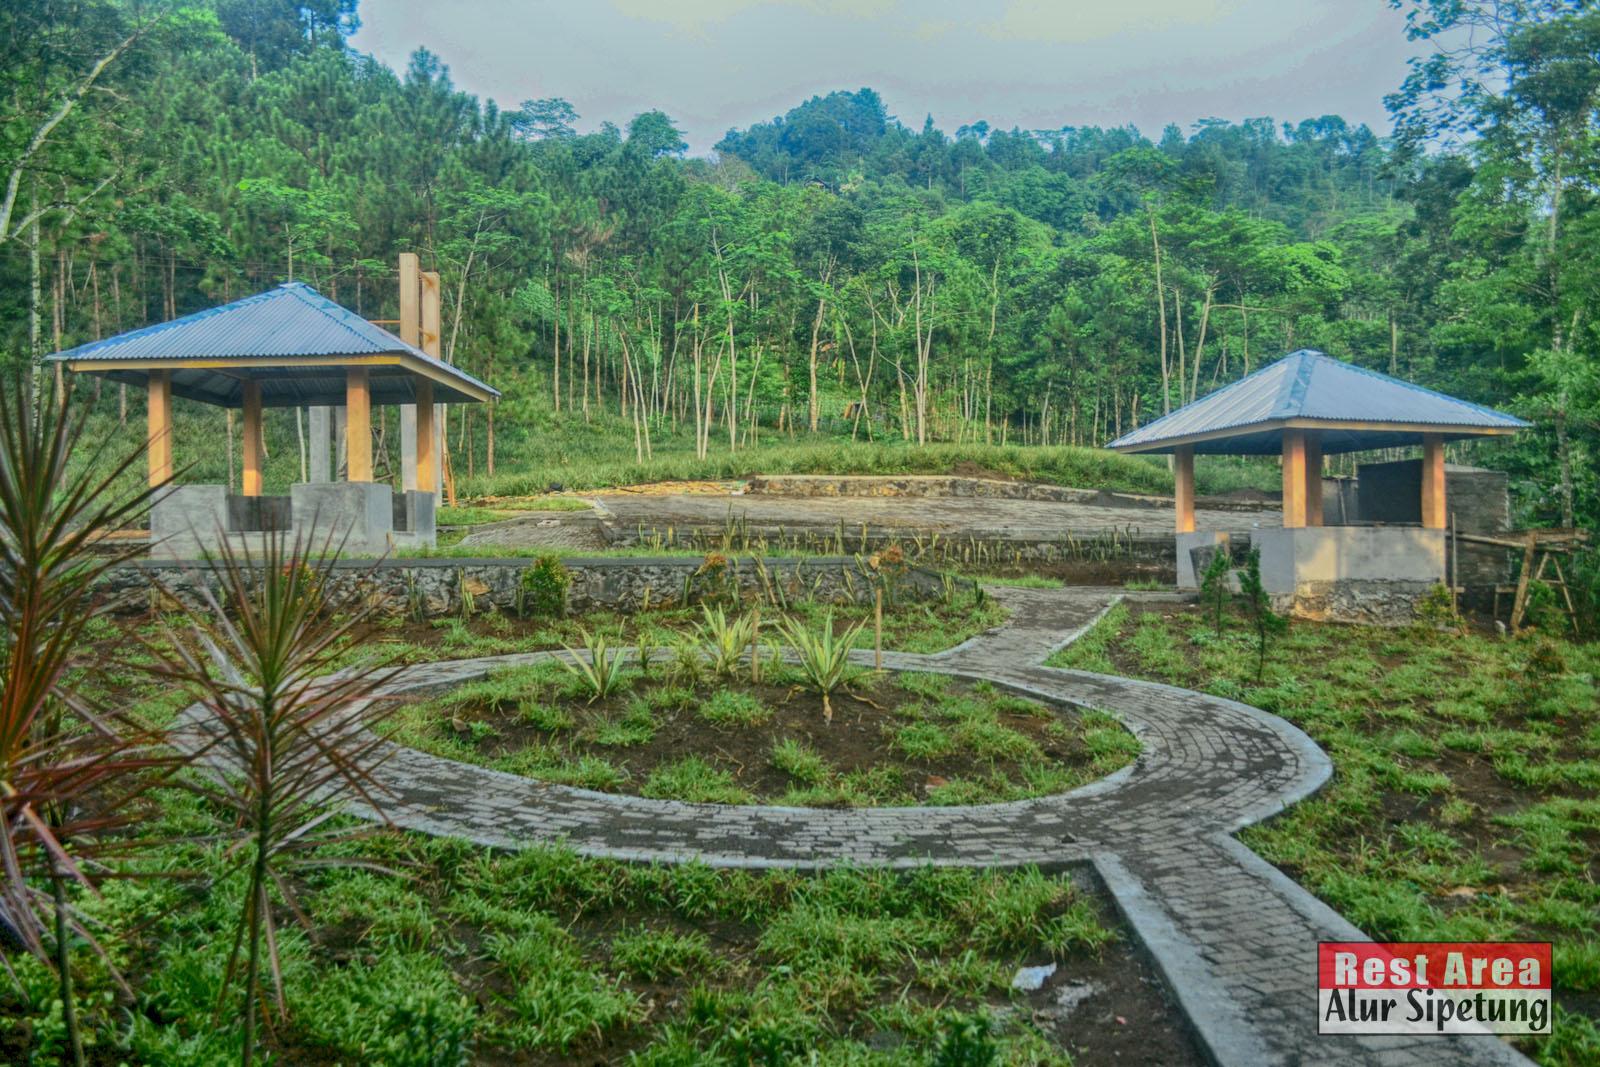 Rest Area Alur Sipetung